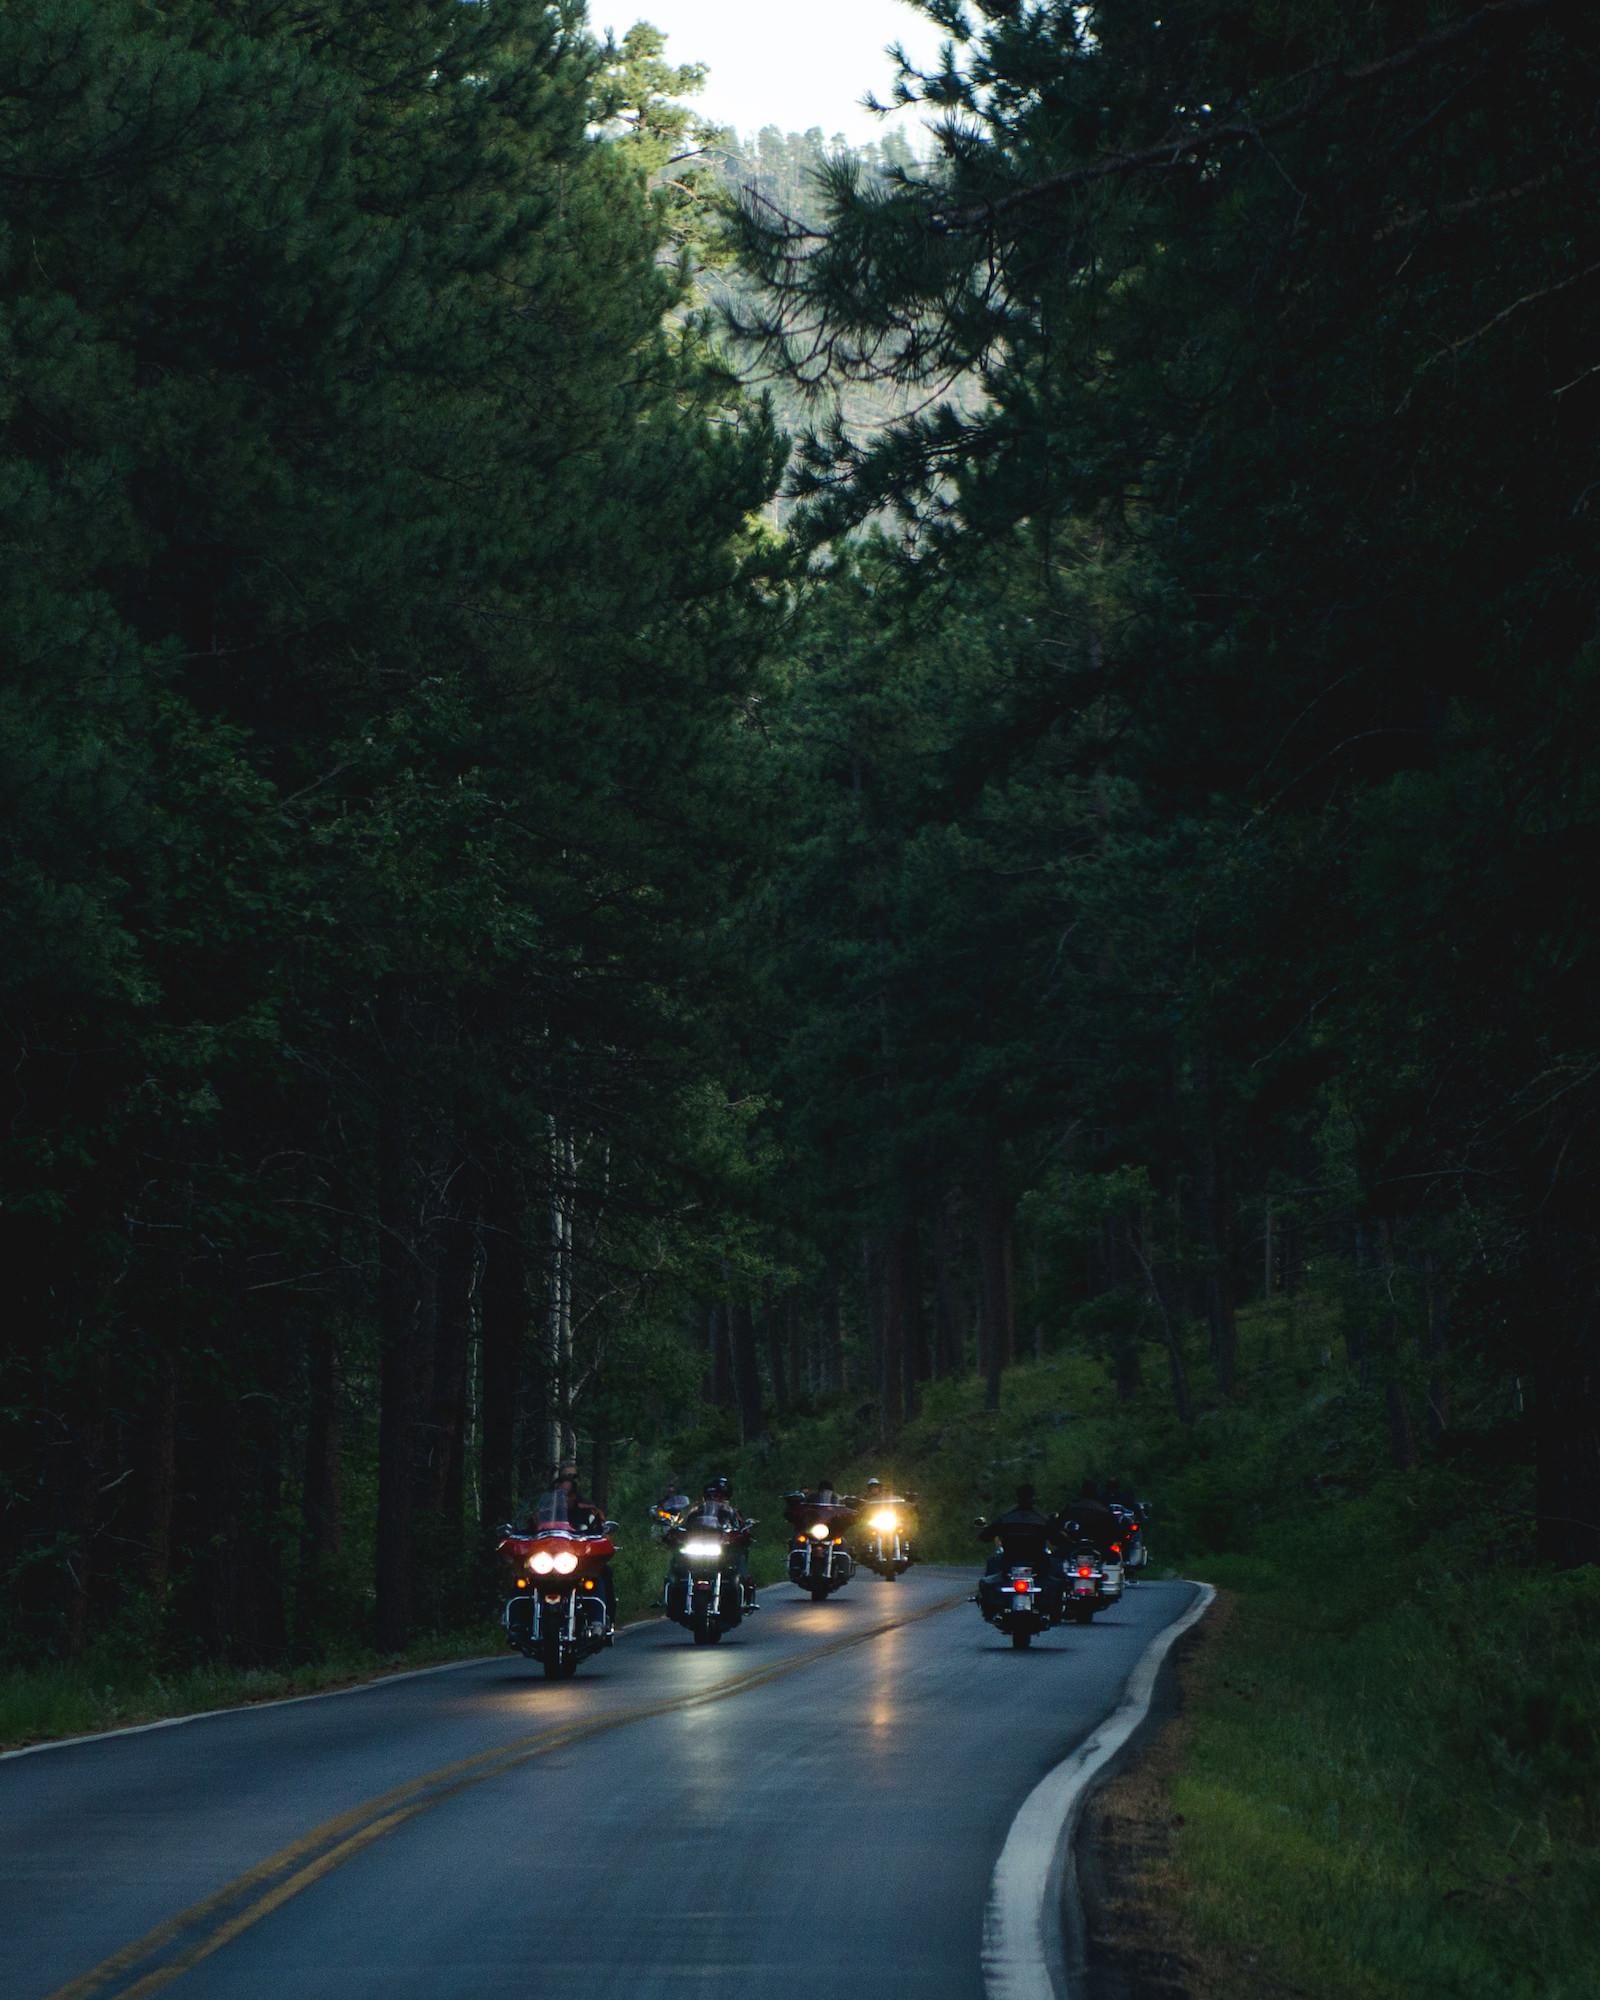 polar-visual-taylor-sheppard-photography-photo-video-motion-design-graphic-blackhills-south-dakota-sturgis-bike-rally-needles-highway-motorcycle-mount-rushmore-usa.jpg